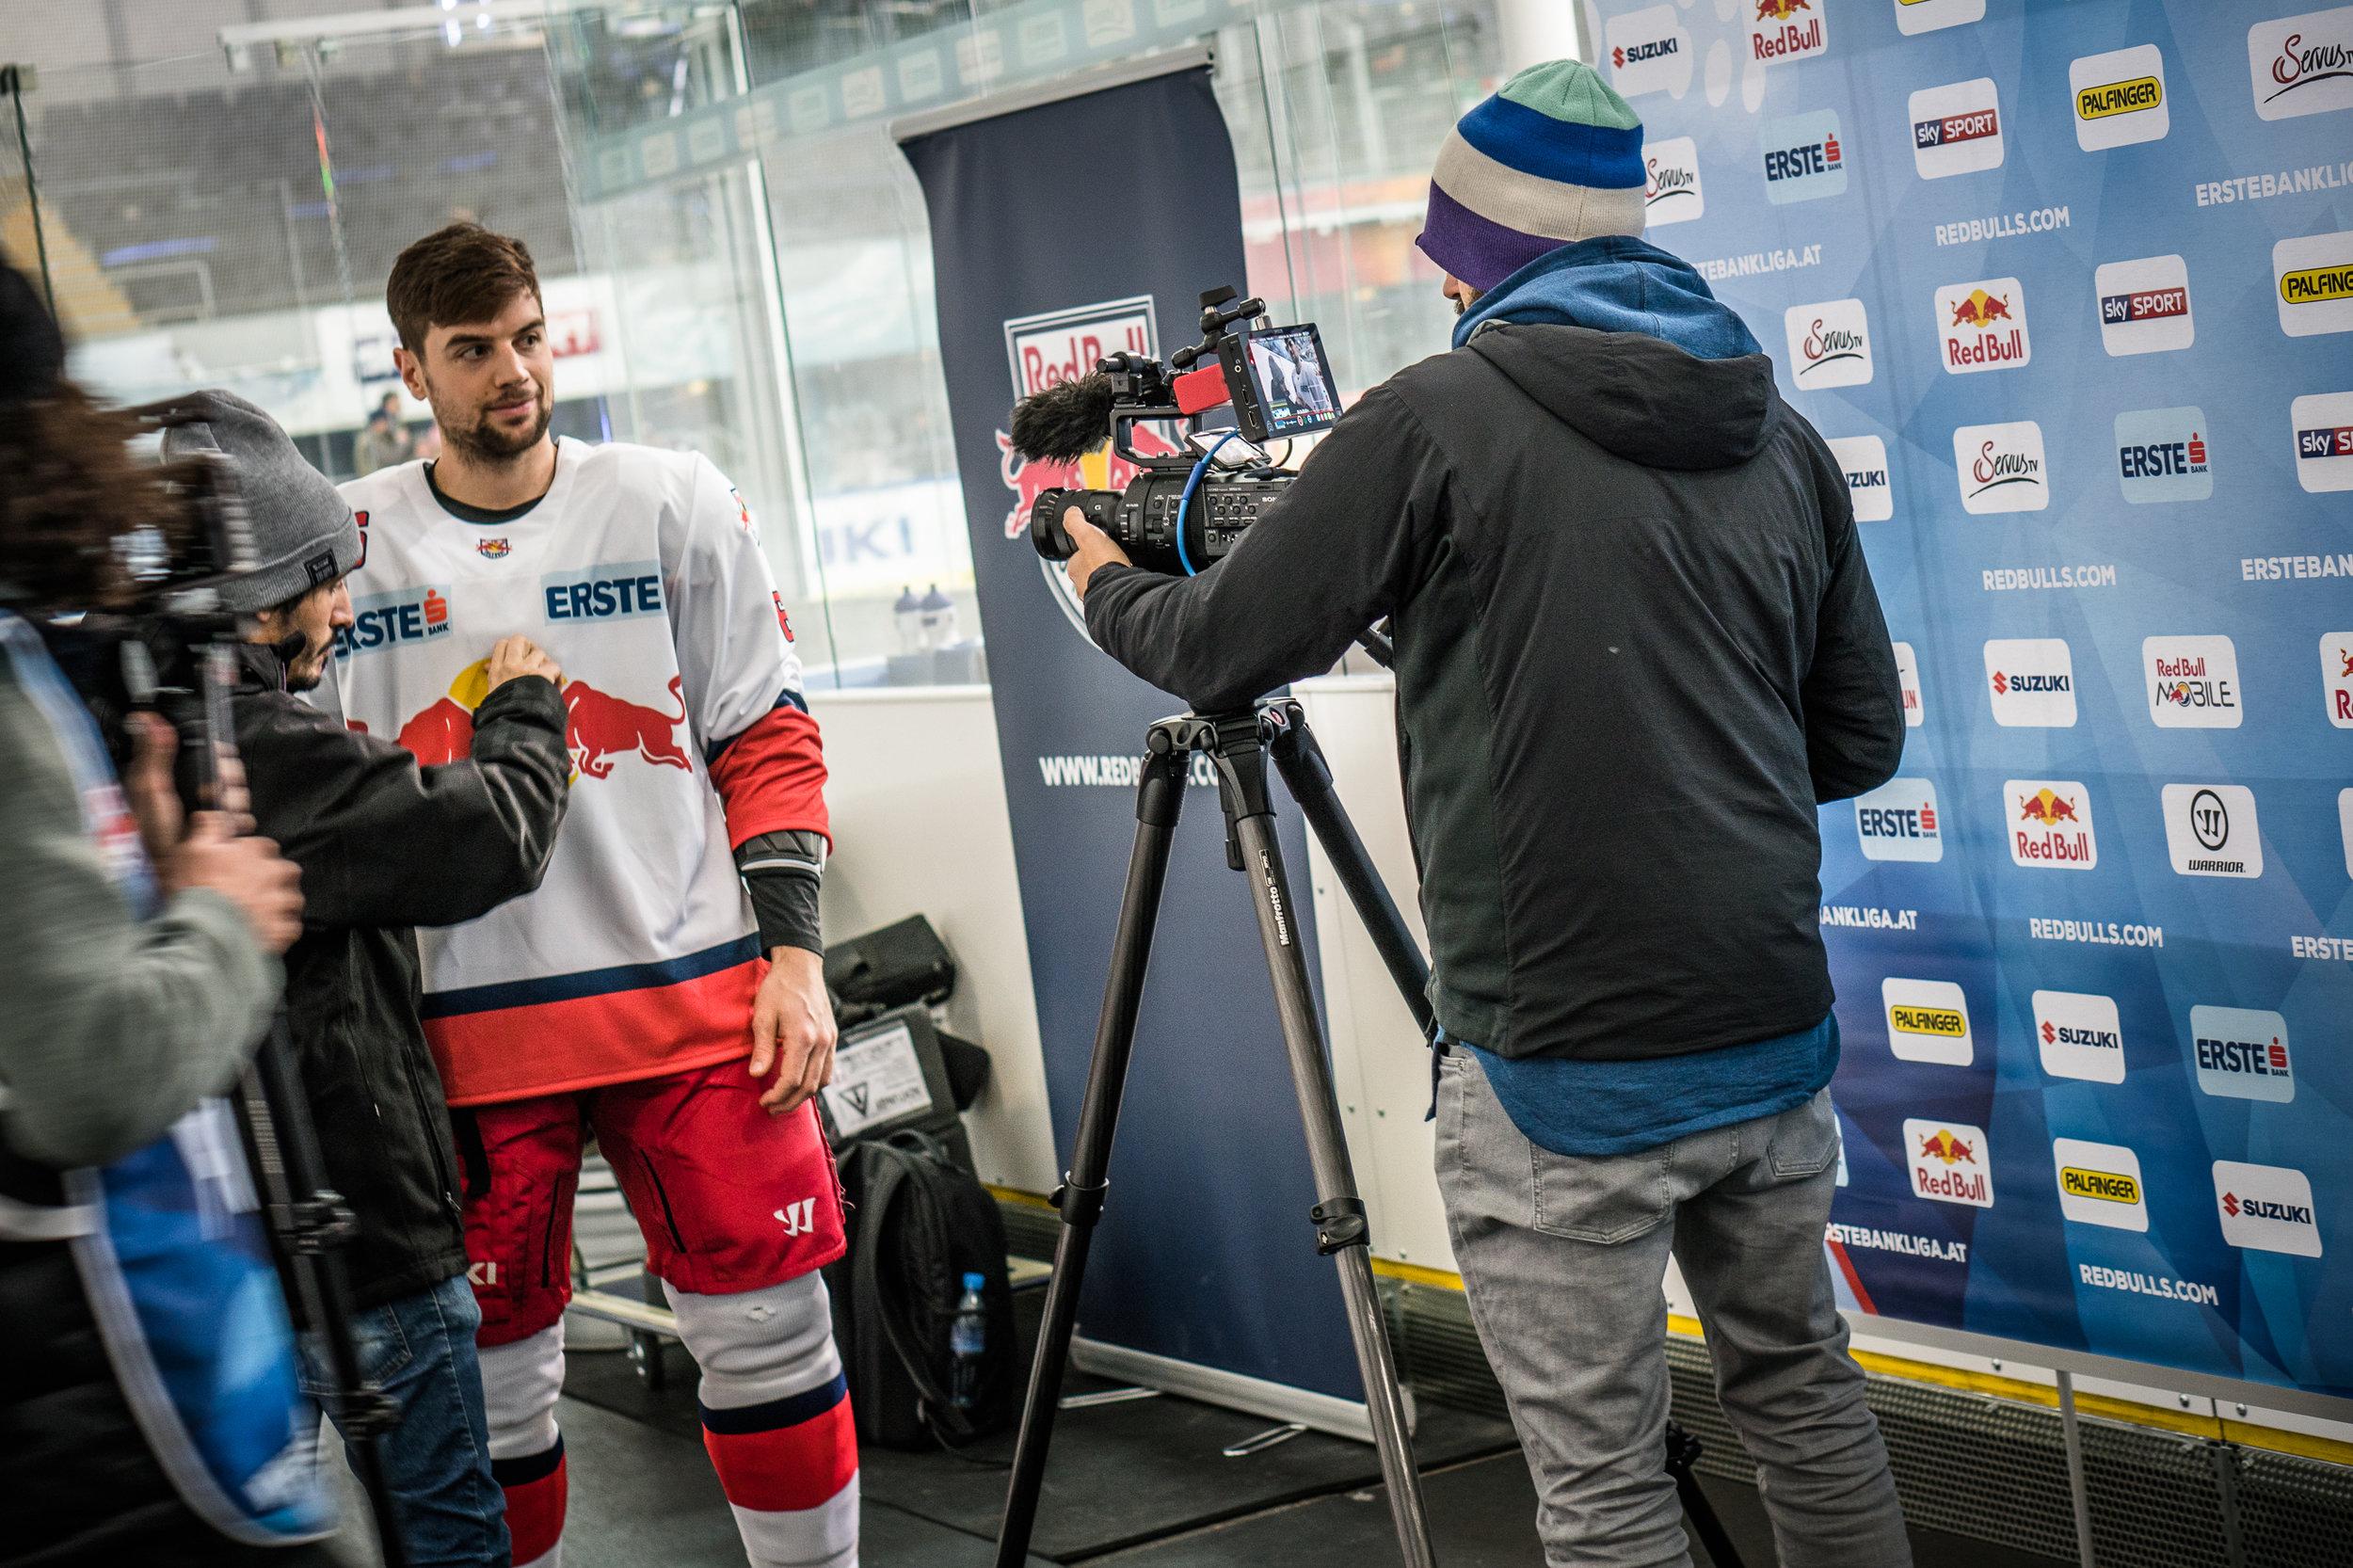 EpicMinutes-Behind-RedBull-Eishockey-WEB-by-BAUSE-018.jpg